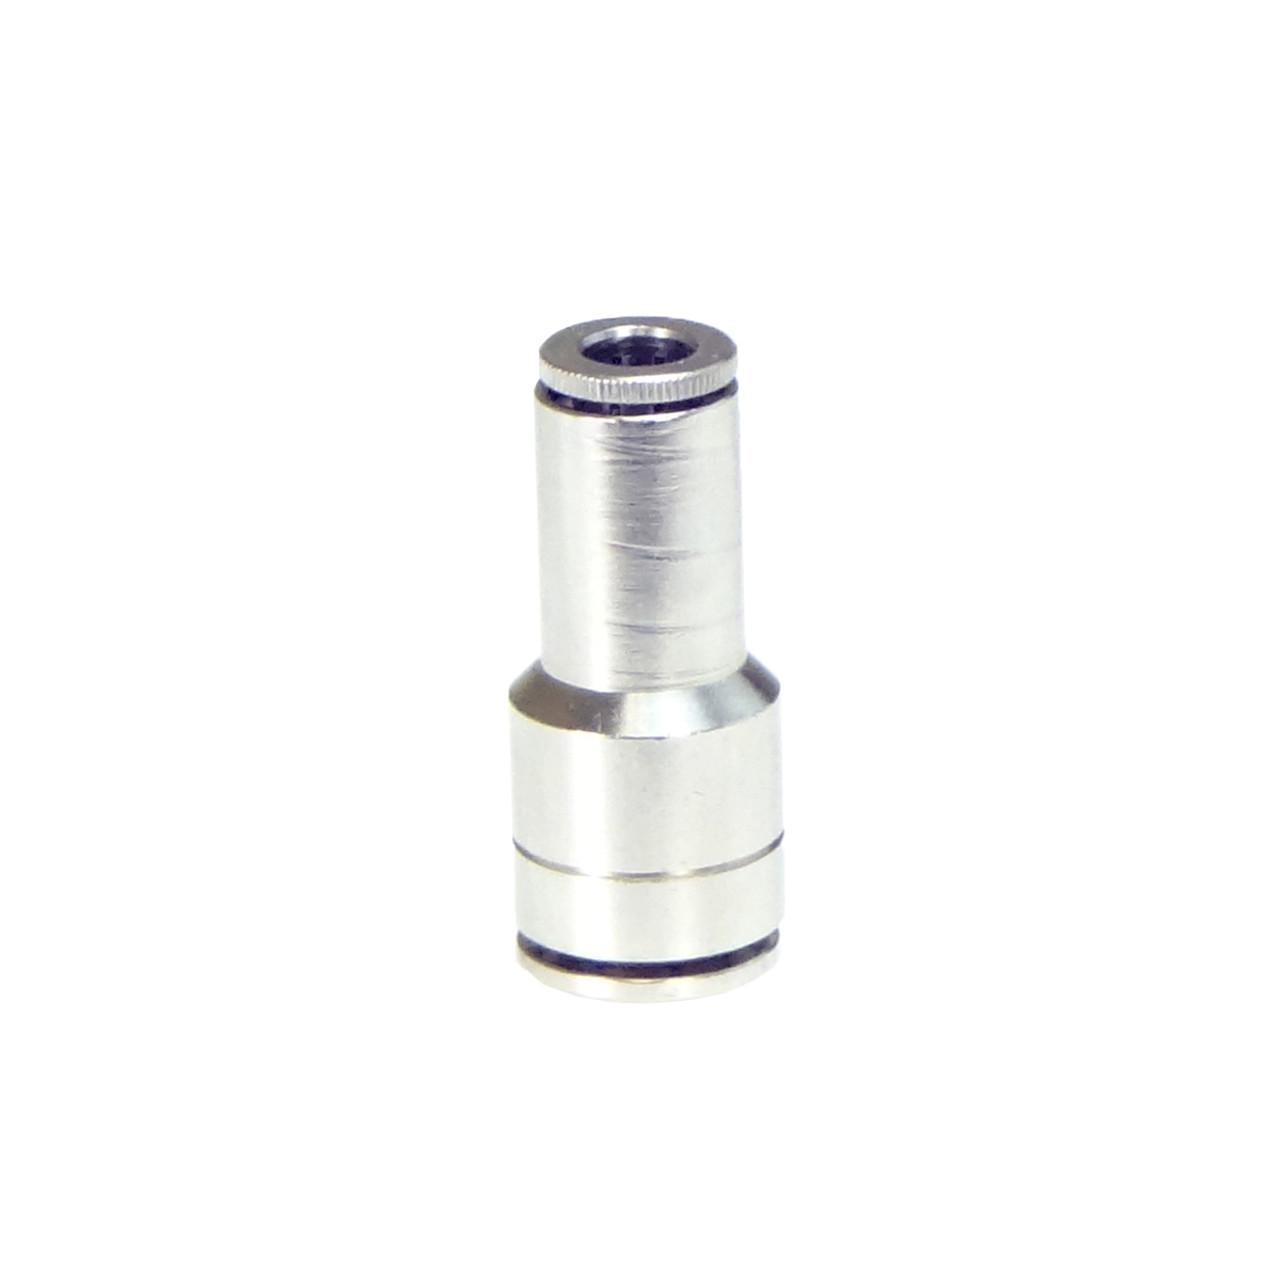 High Pressure 1/4-3/8 Compression Reducer